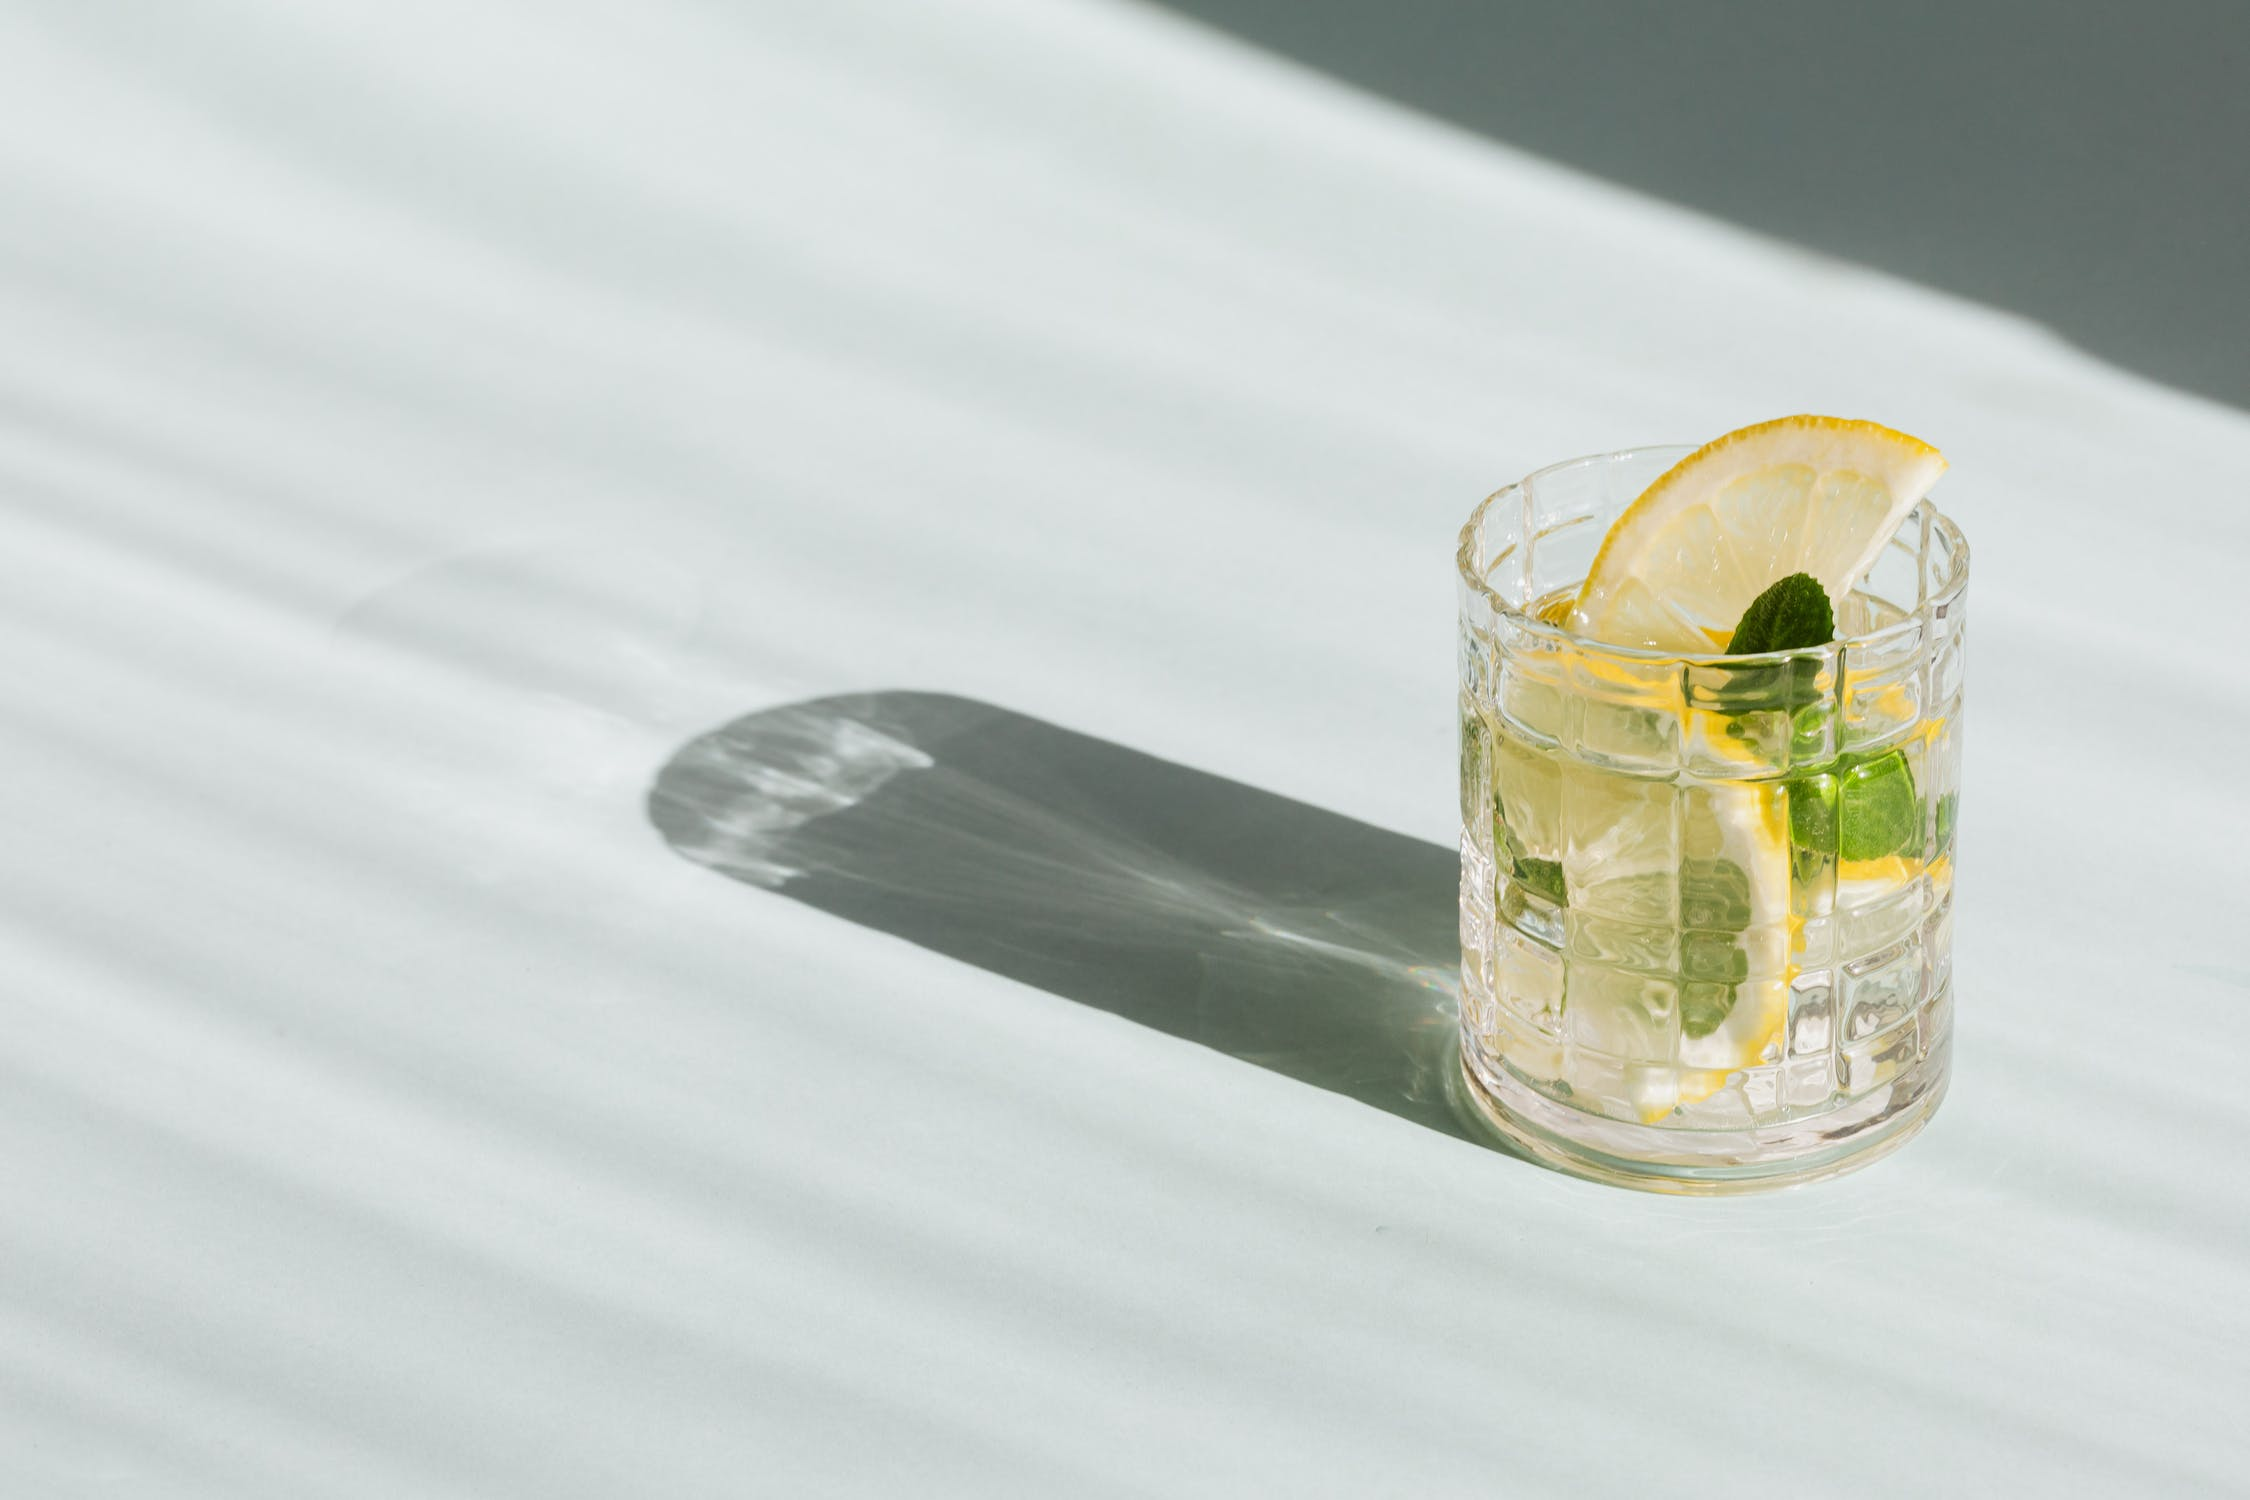 A glass of vodka and lemon